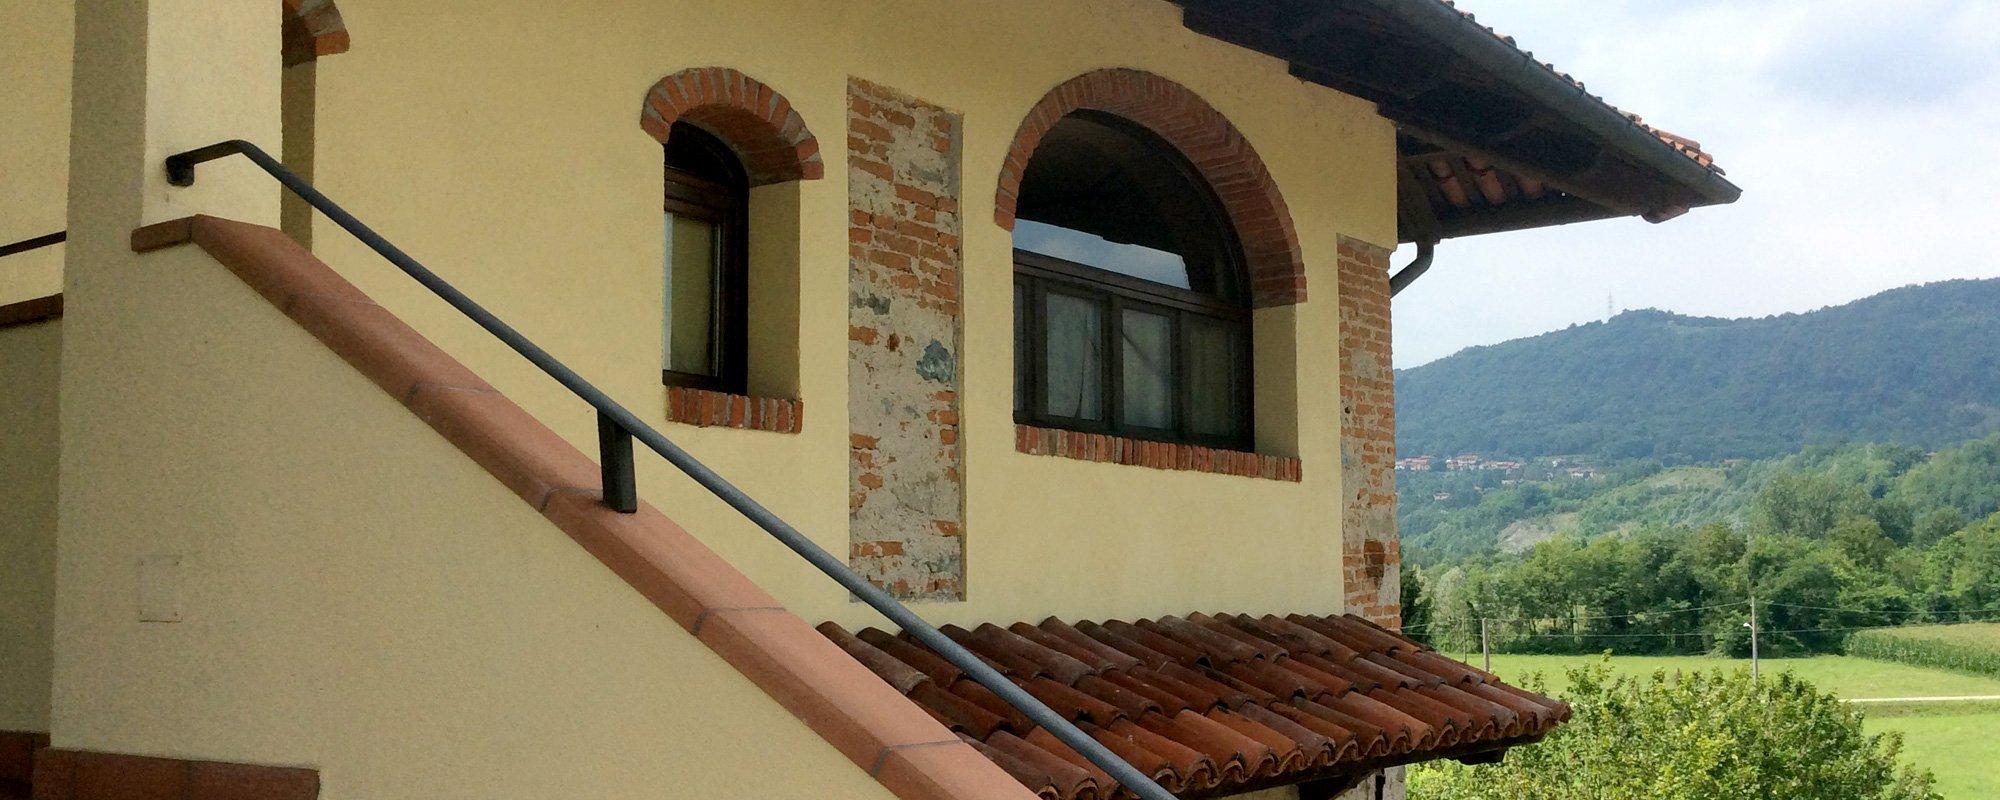 Una vista esterna della casa